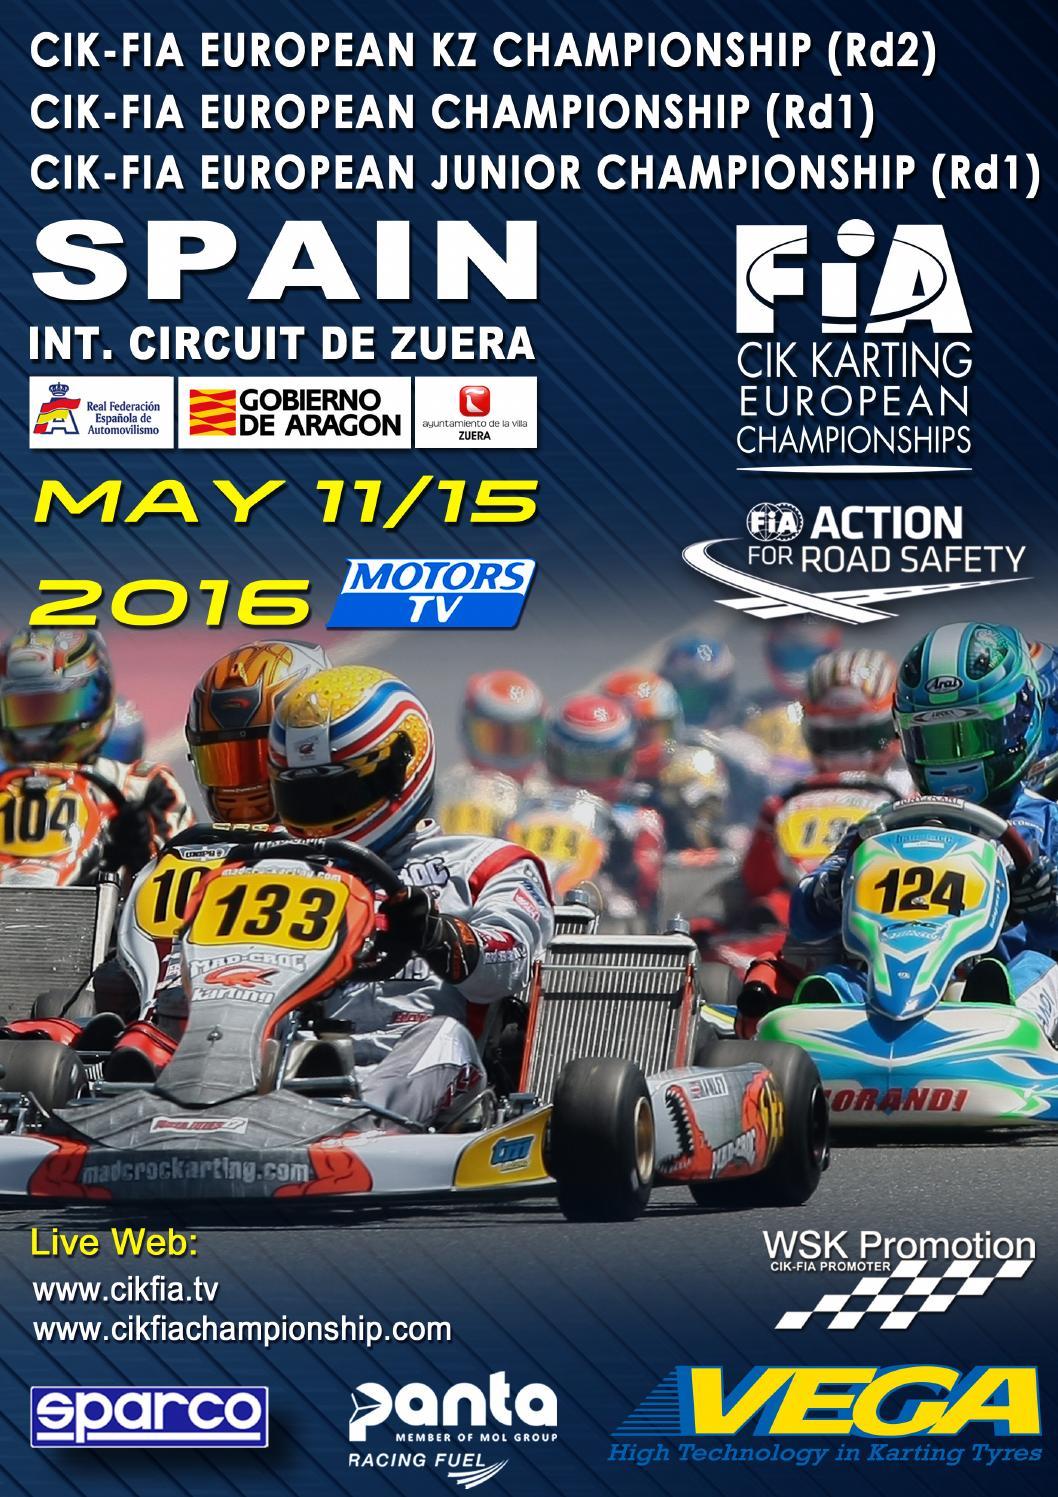 Circuito Zuera : Cik fia european championship academy trophy 2016 zuera by wsk